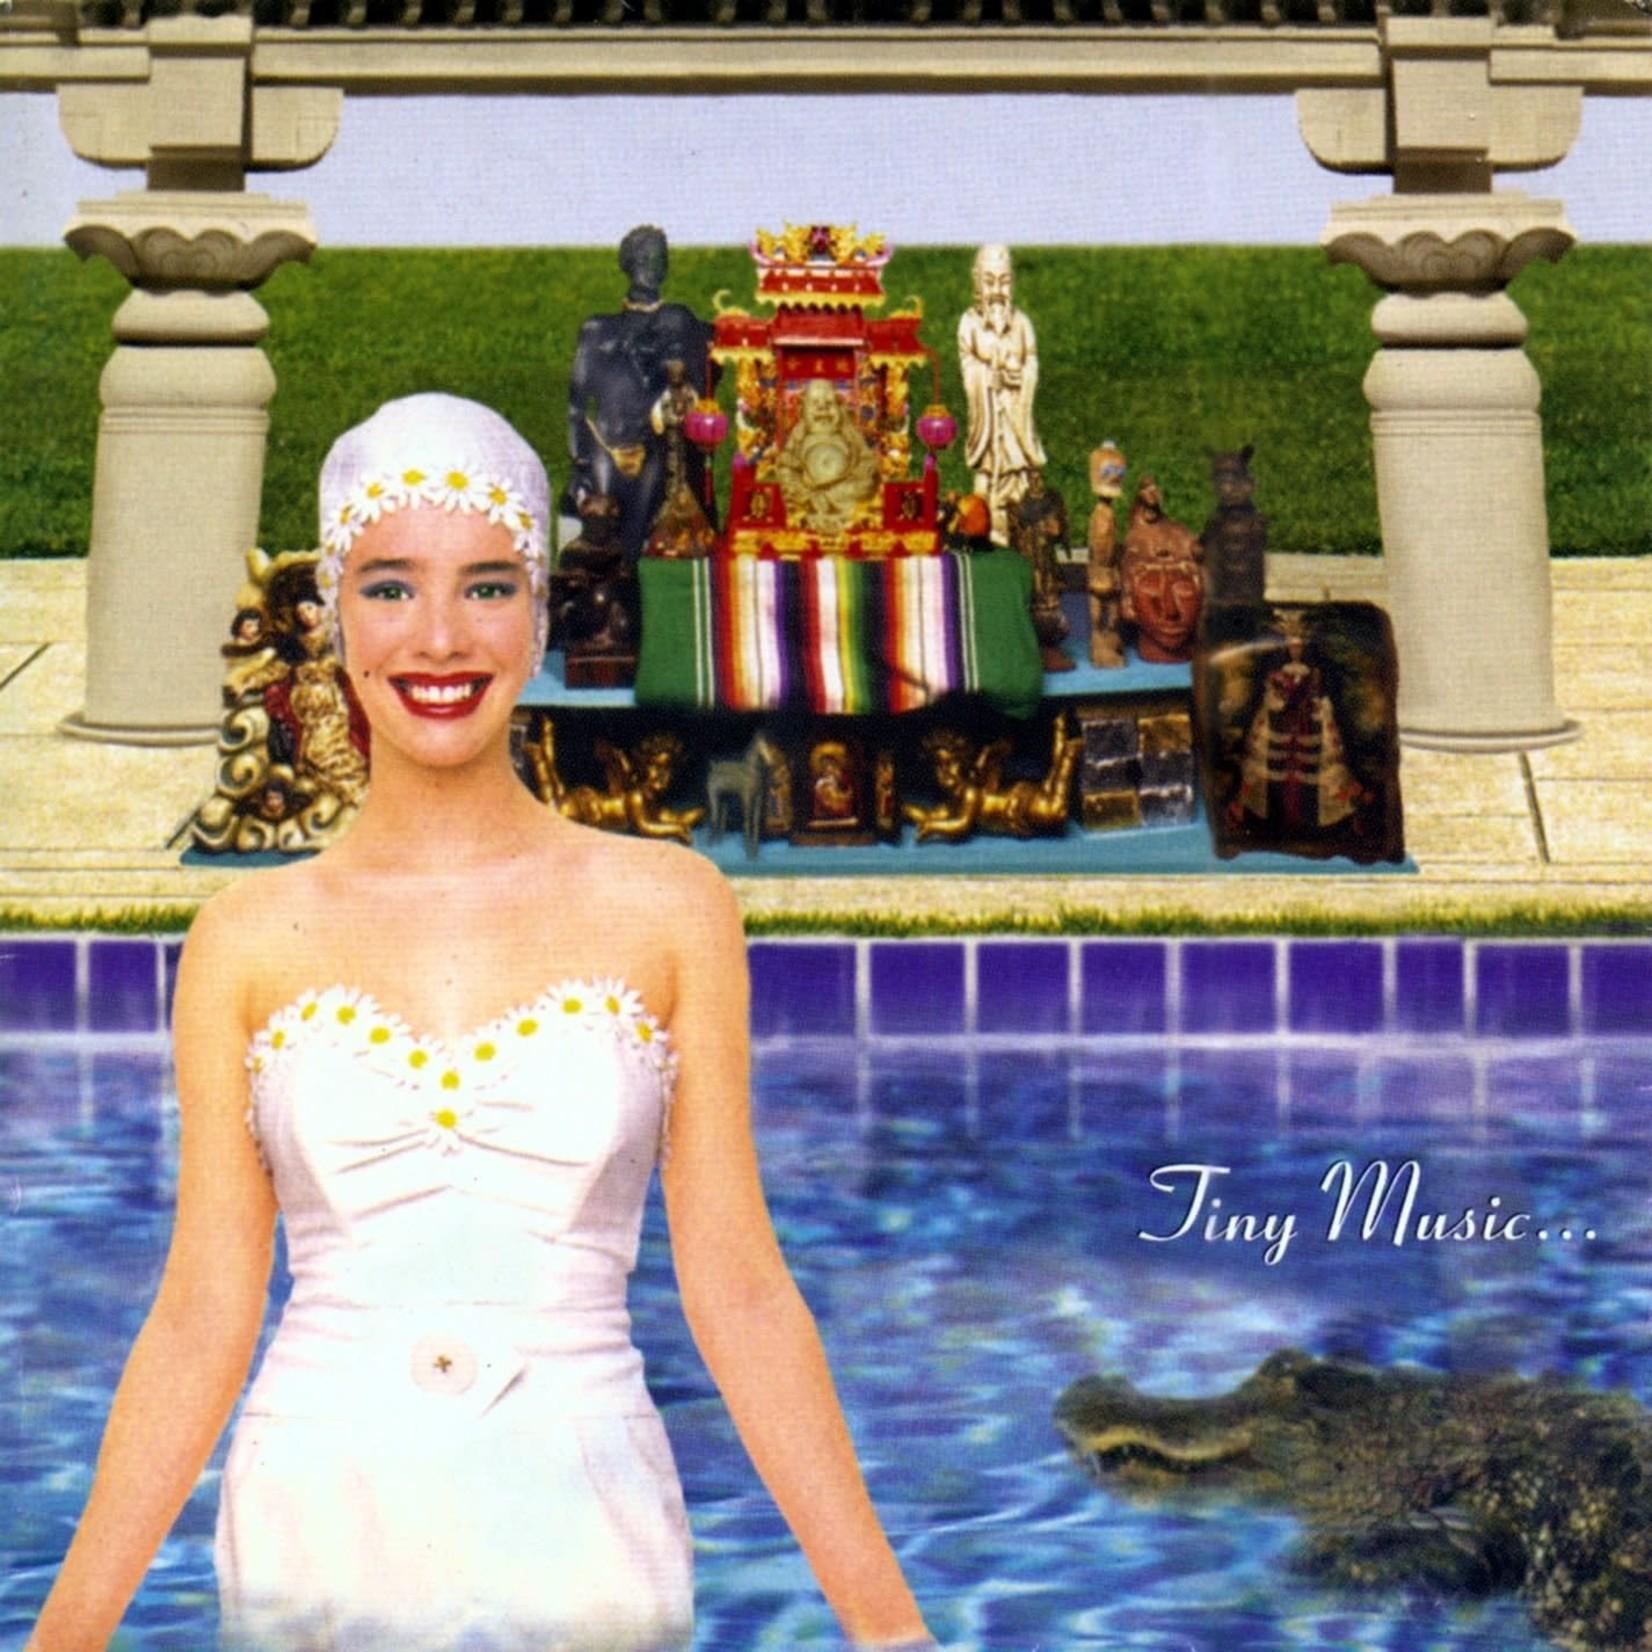 [New] Stone Temple Pilots: Tiny Music